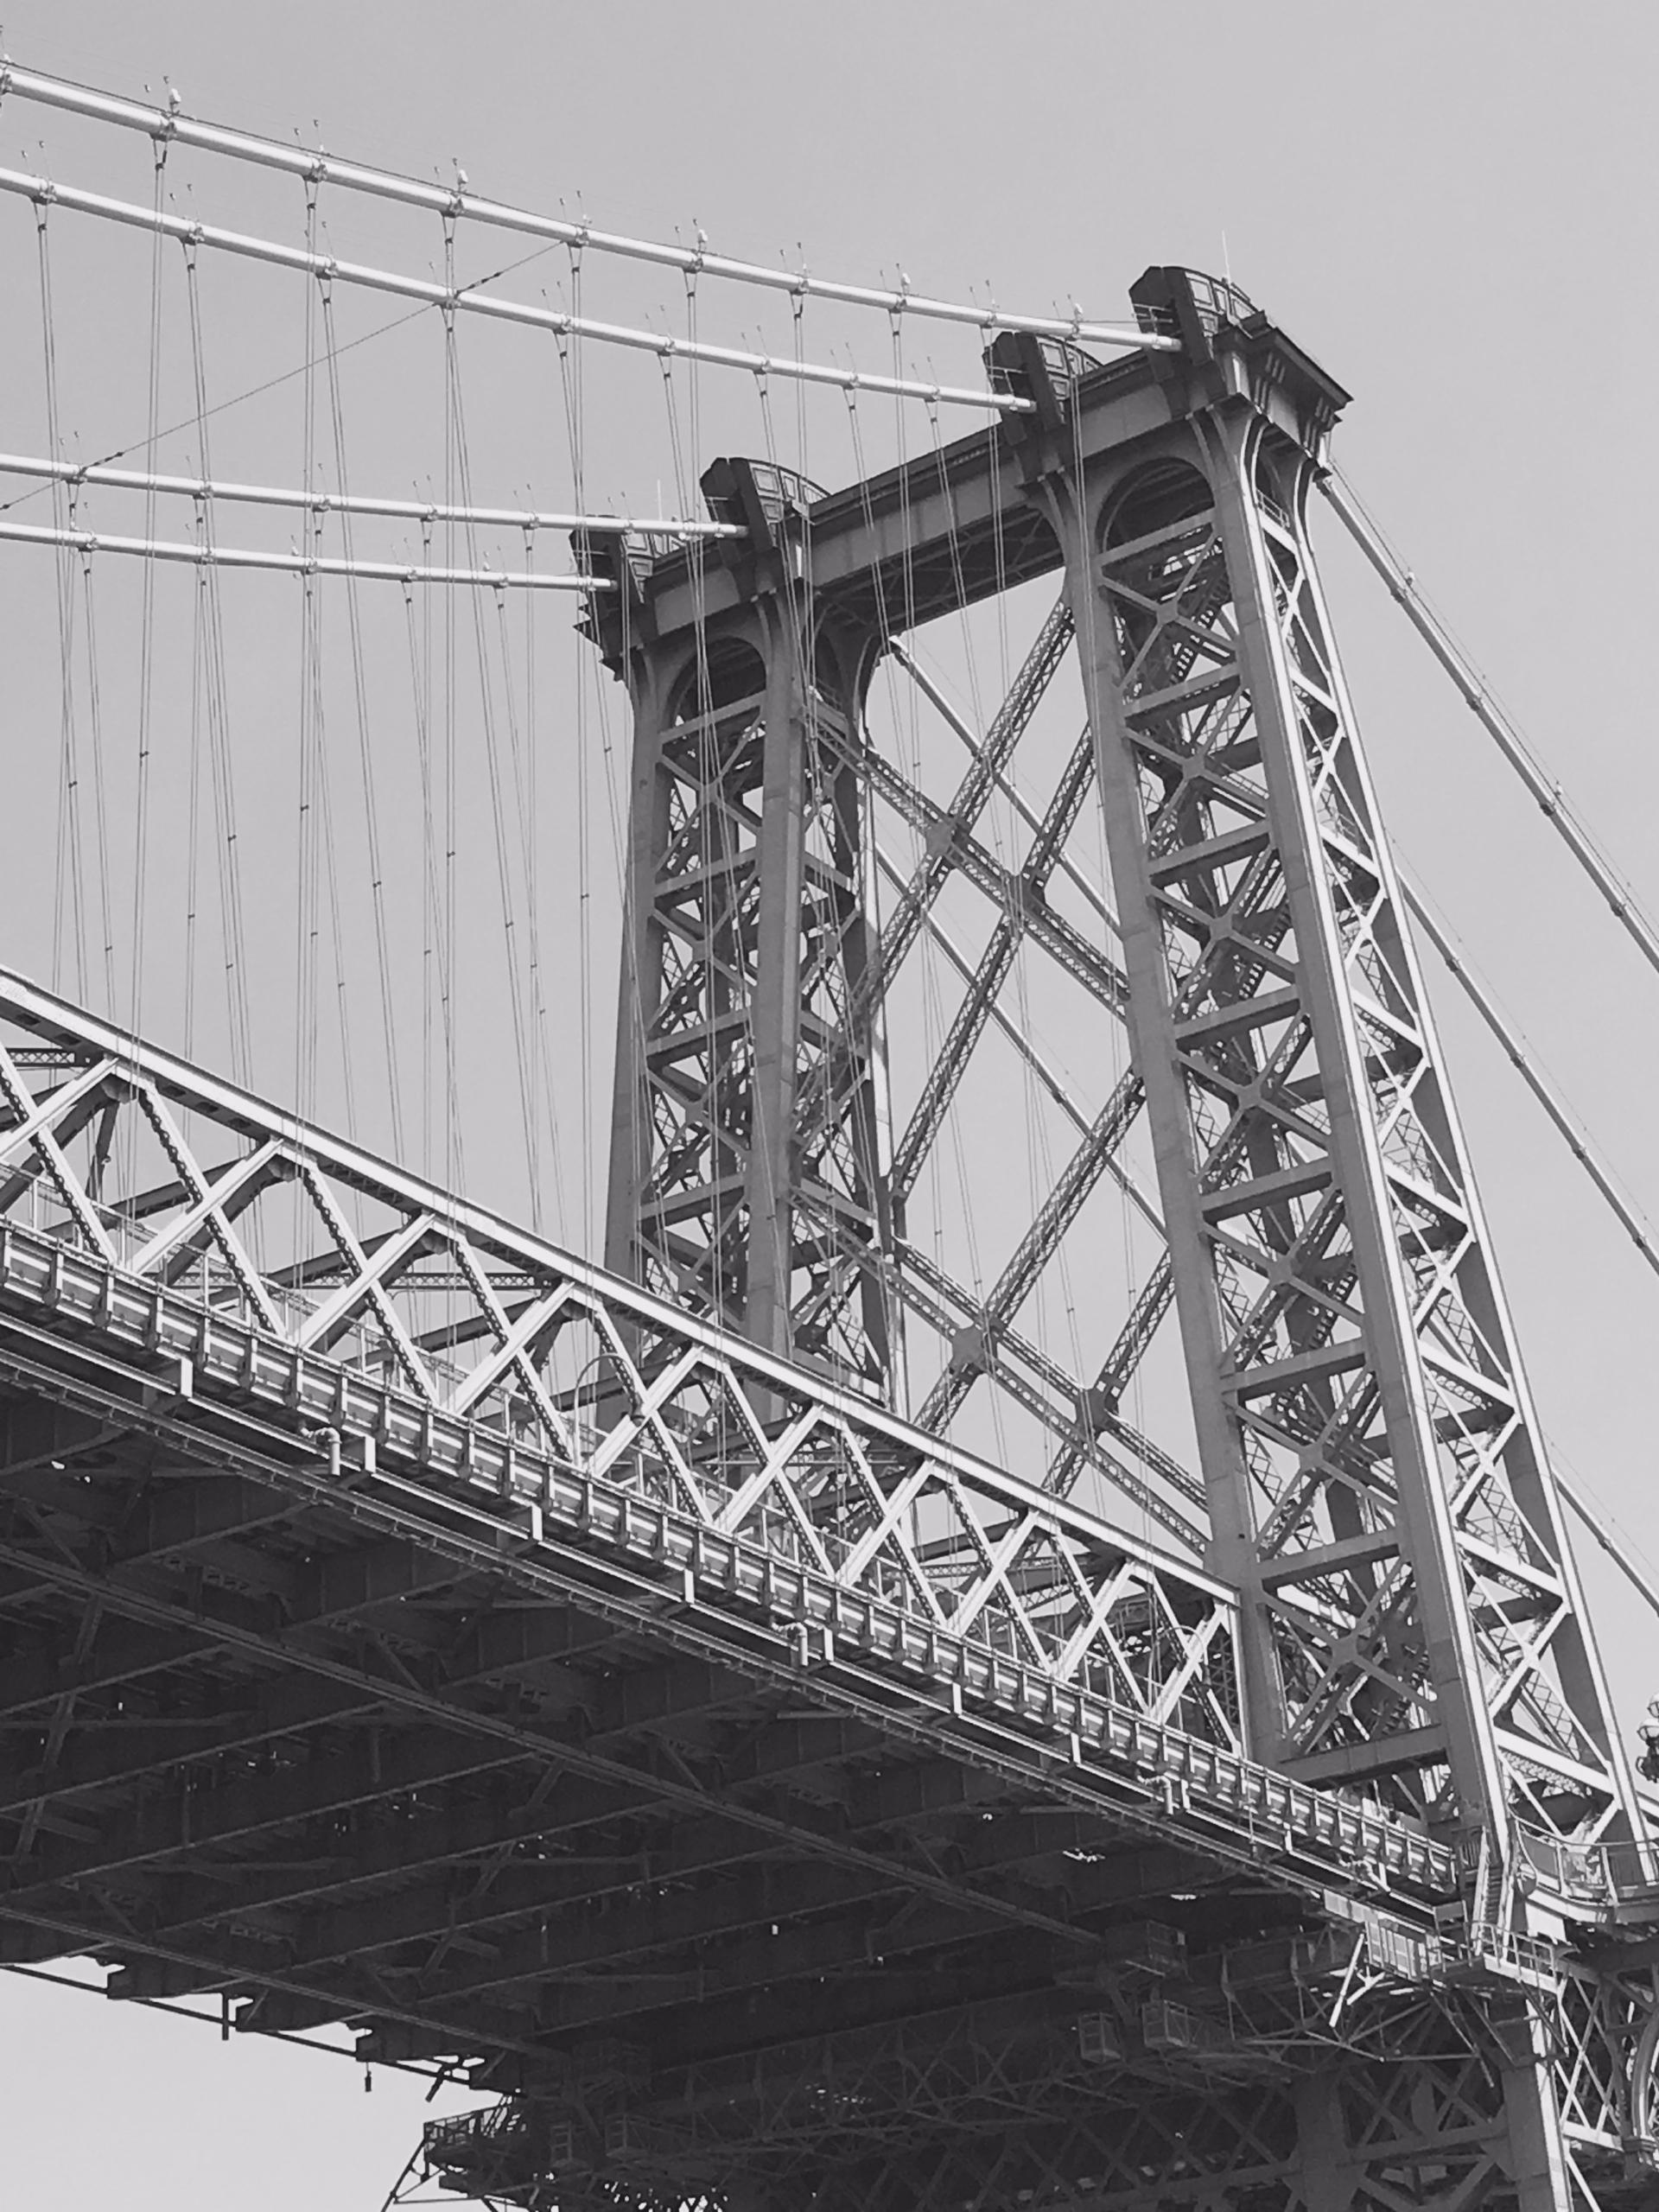 Williamsburg Bridge - photography - gordongray | ello